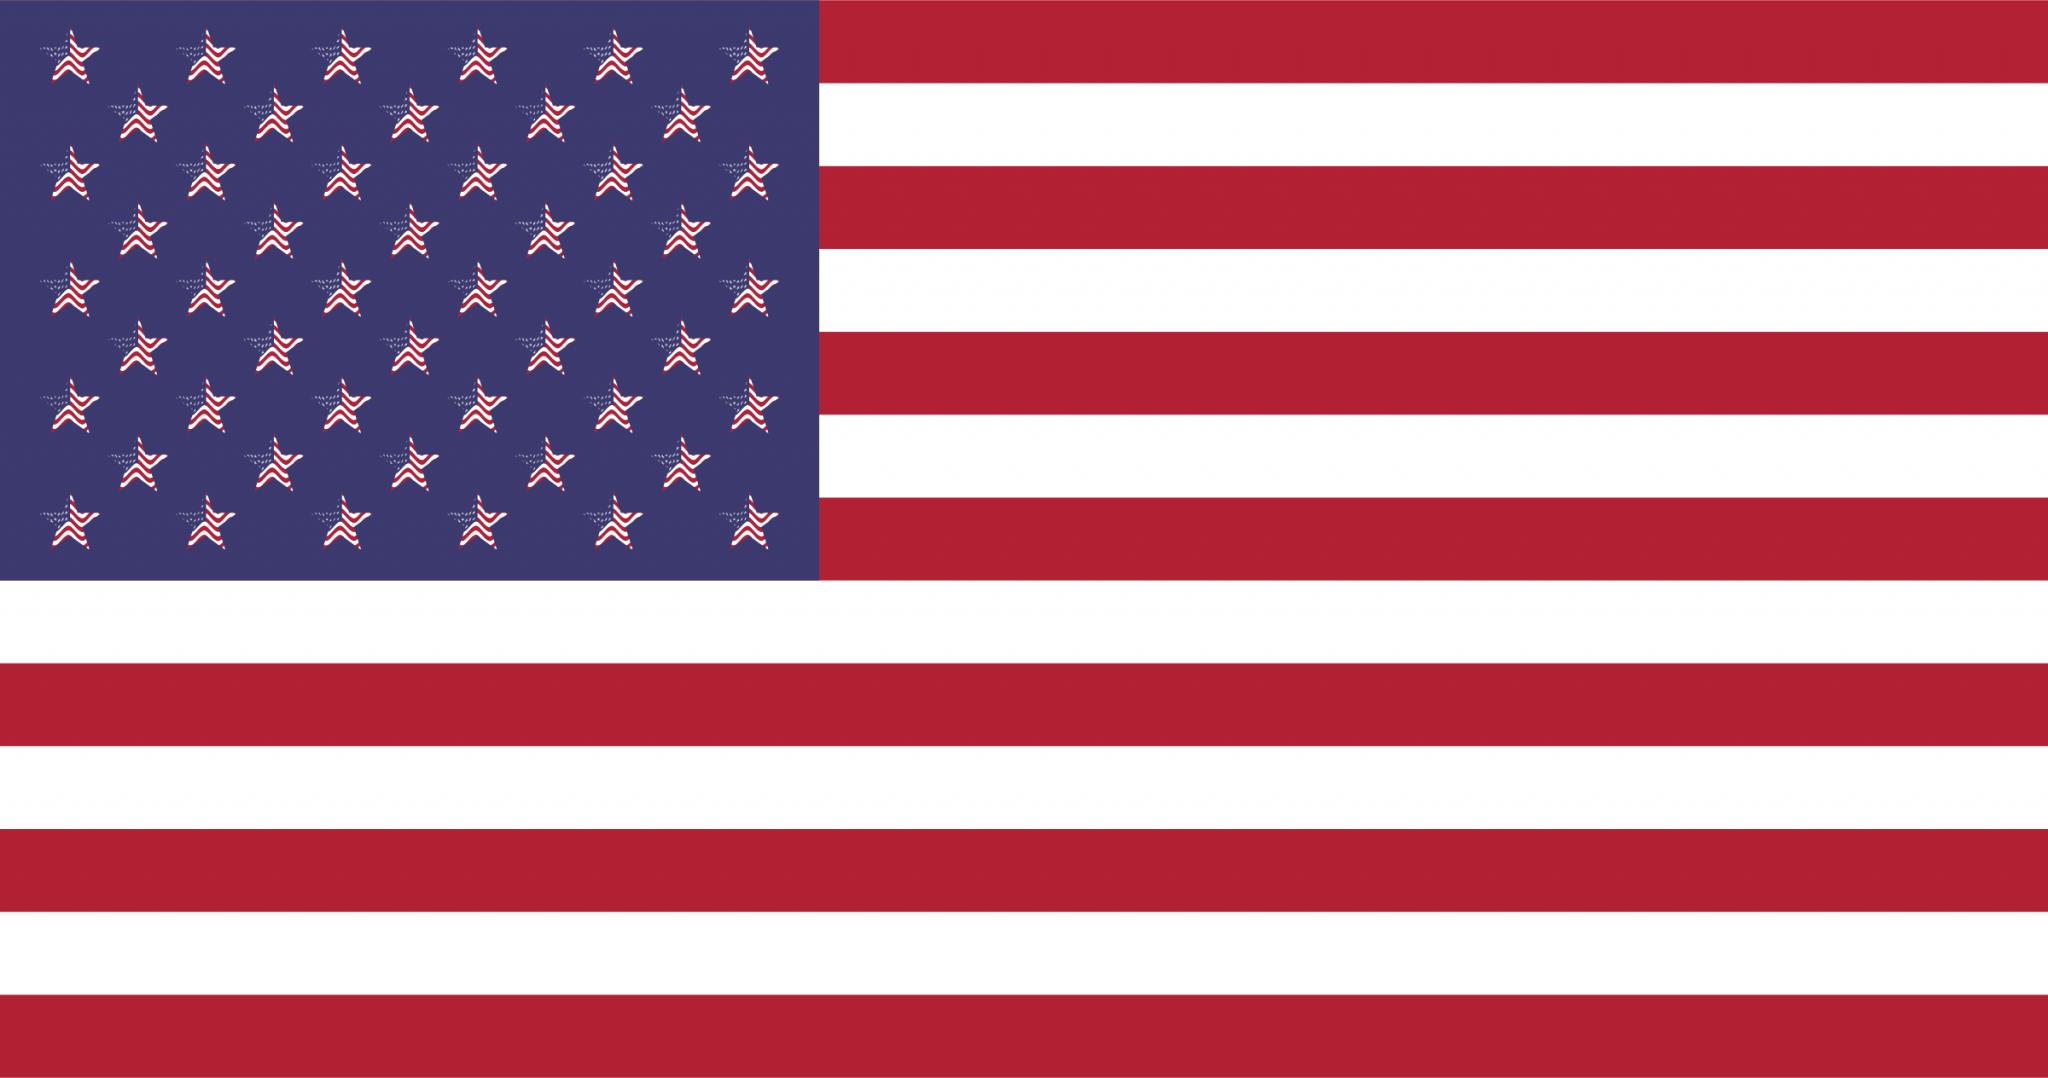 American Flag Wallpaper Full Size American Flag Wallpaper Flag American Flag